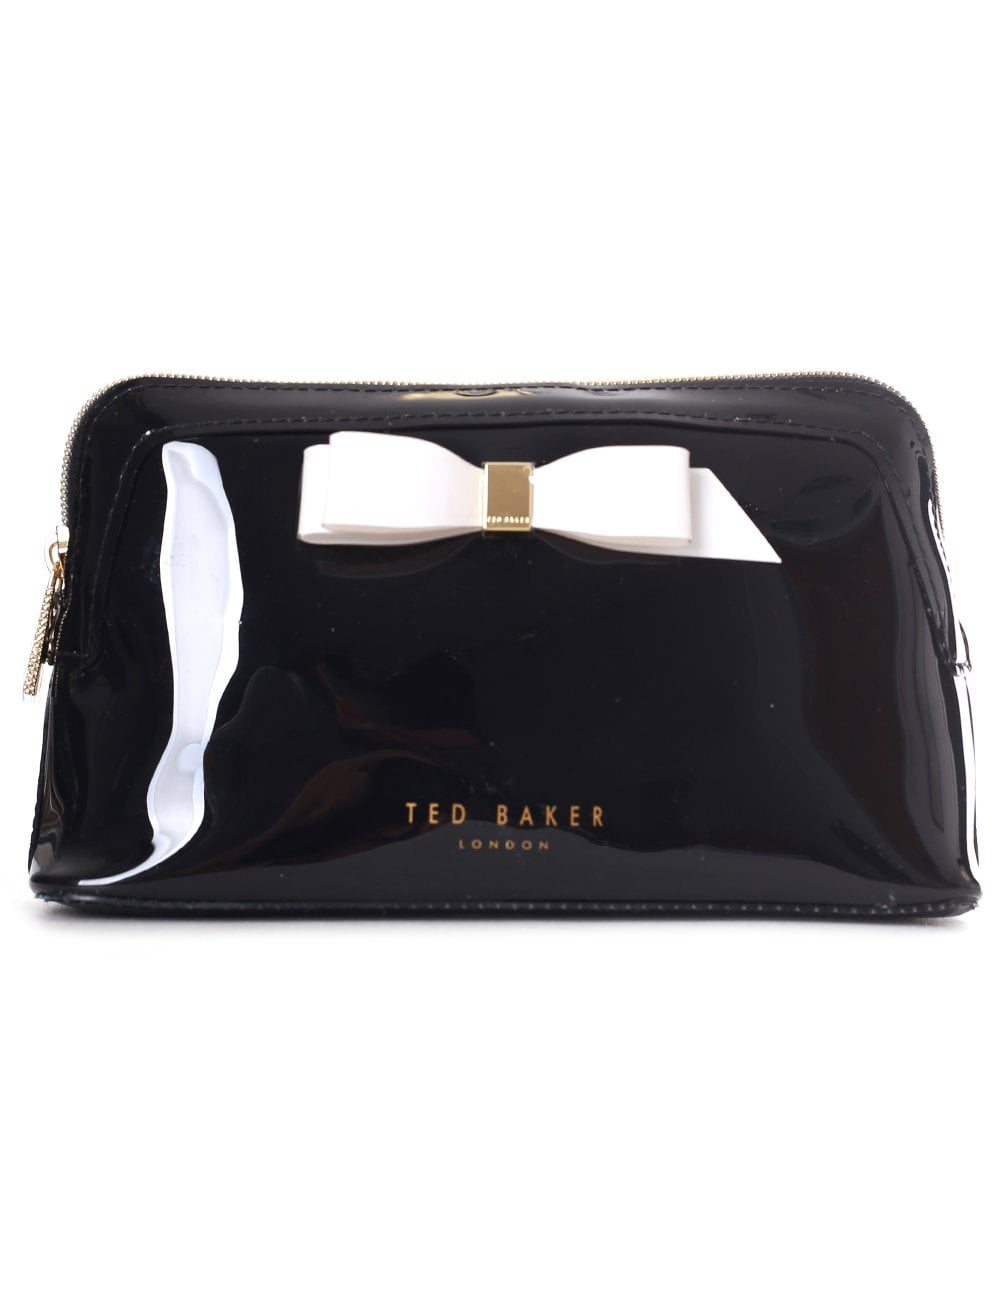 a1e4aa8d59 Ted Baker Women's Cahire Bow Makeup Bag